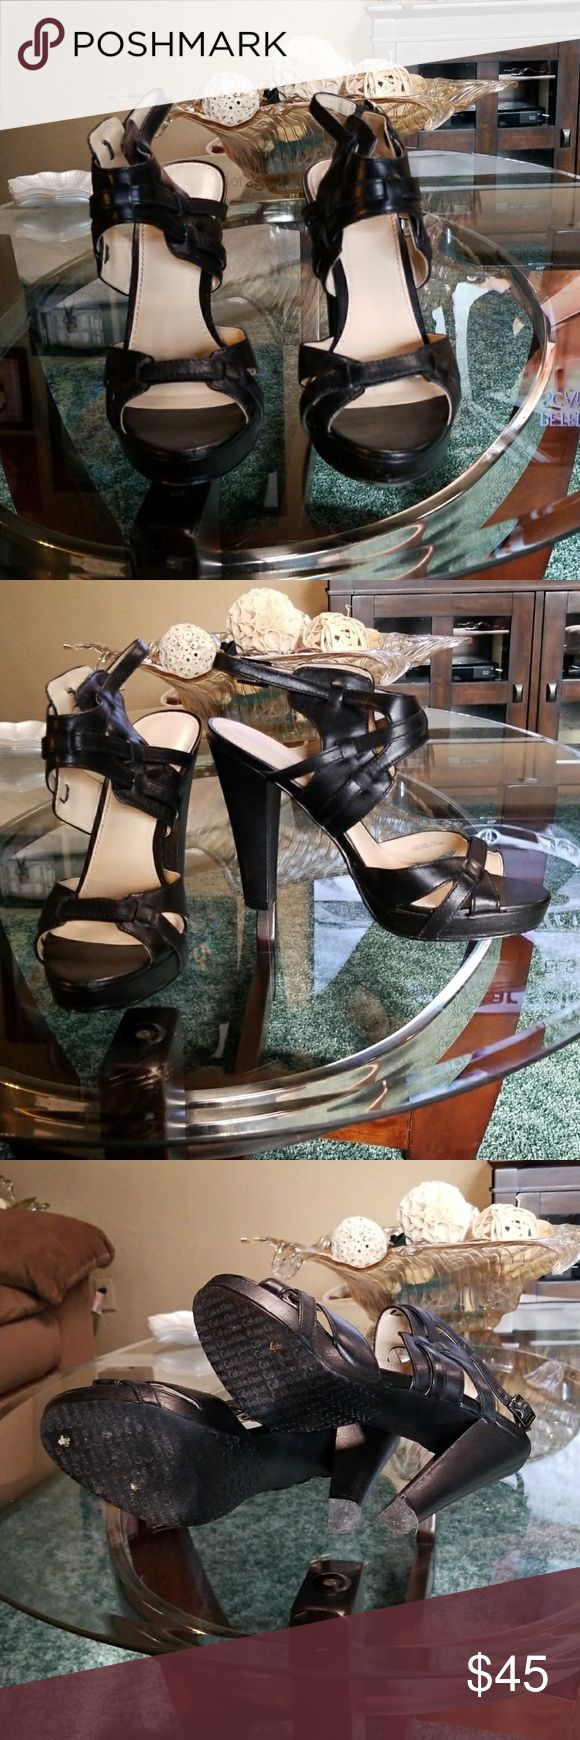 "Calvin Klein heels Worn once, black 4"" heels with 1/2"" platform. Comes with box. Calvin Klein Shoes Heels"